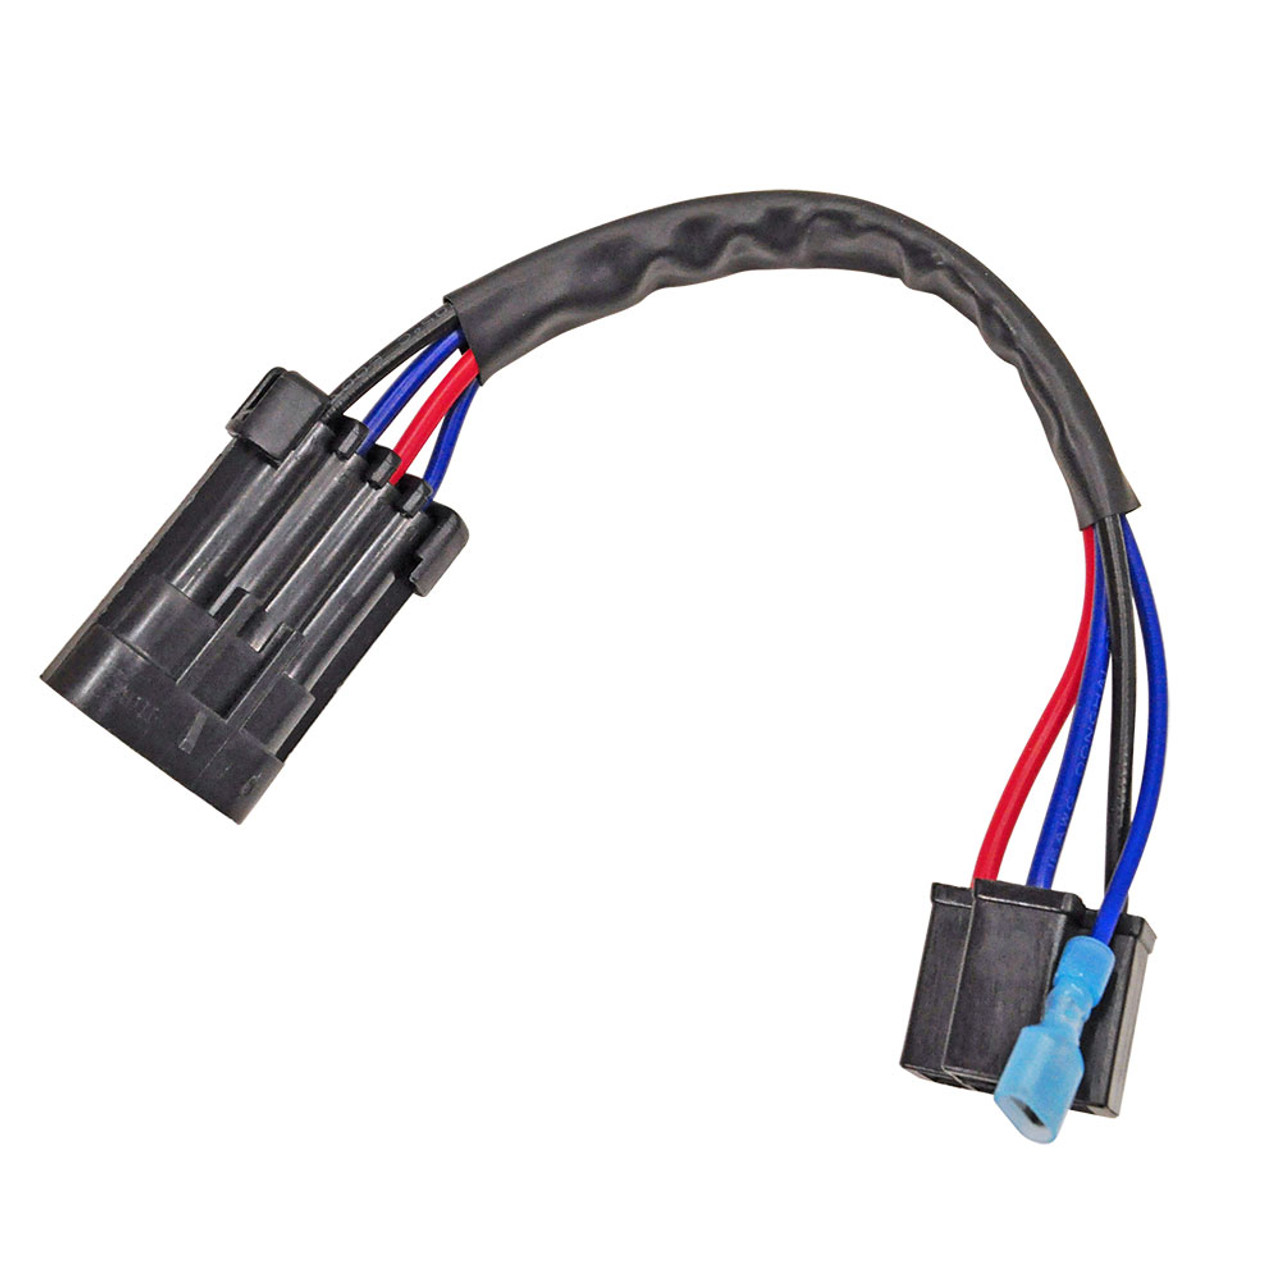 medium resolution of custom dynamics led head lamp adaptor 1 33738 1554396576 jpg c 2 imbypass on